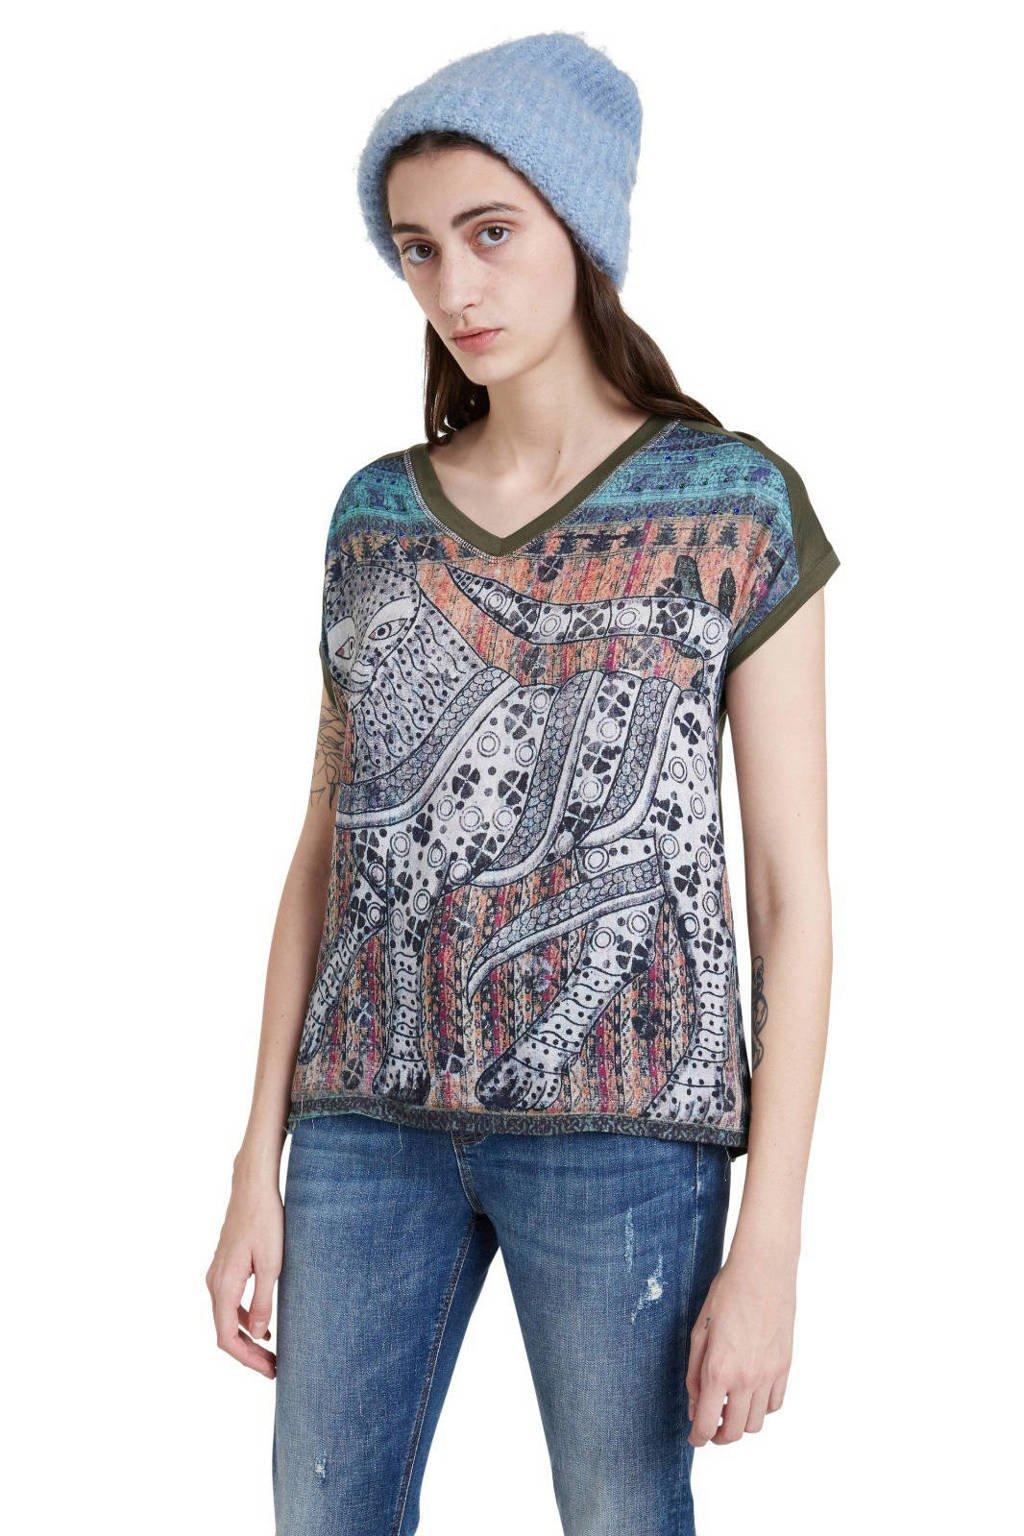 Desigual T-shirt met printopdruk donkergroen/wit/blauw, Donkergroen/wit/blauw